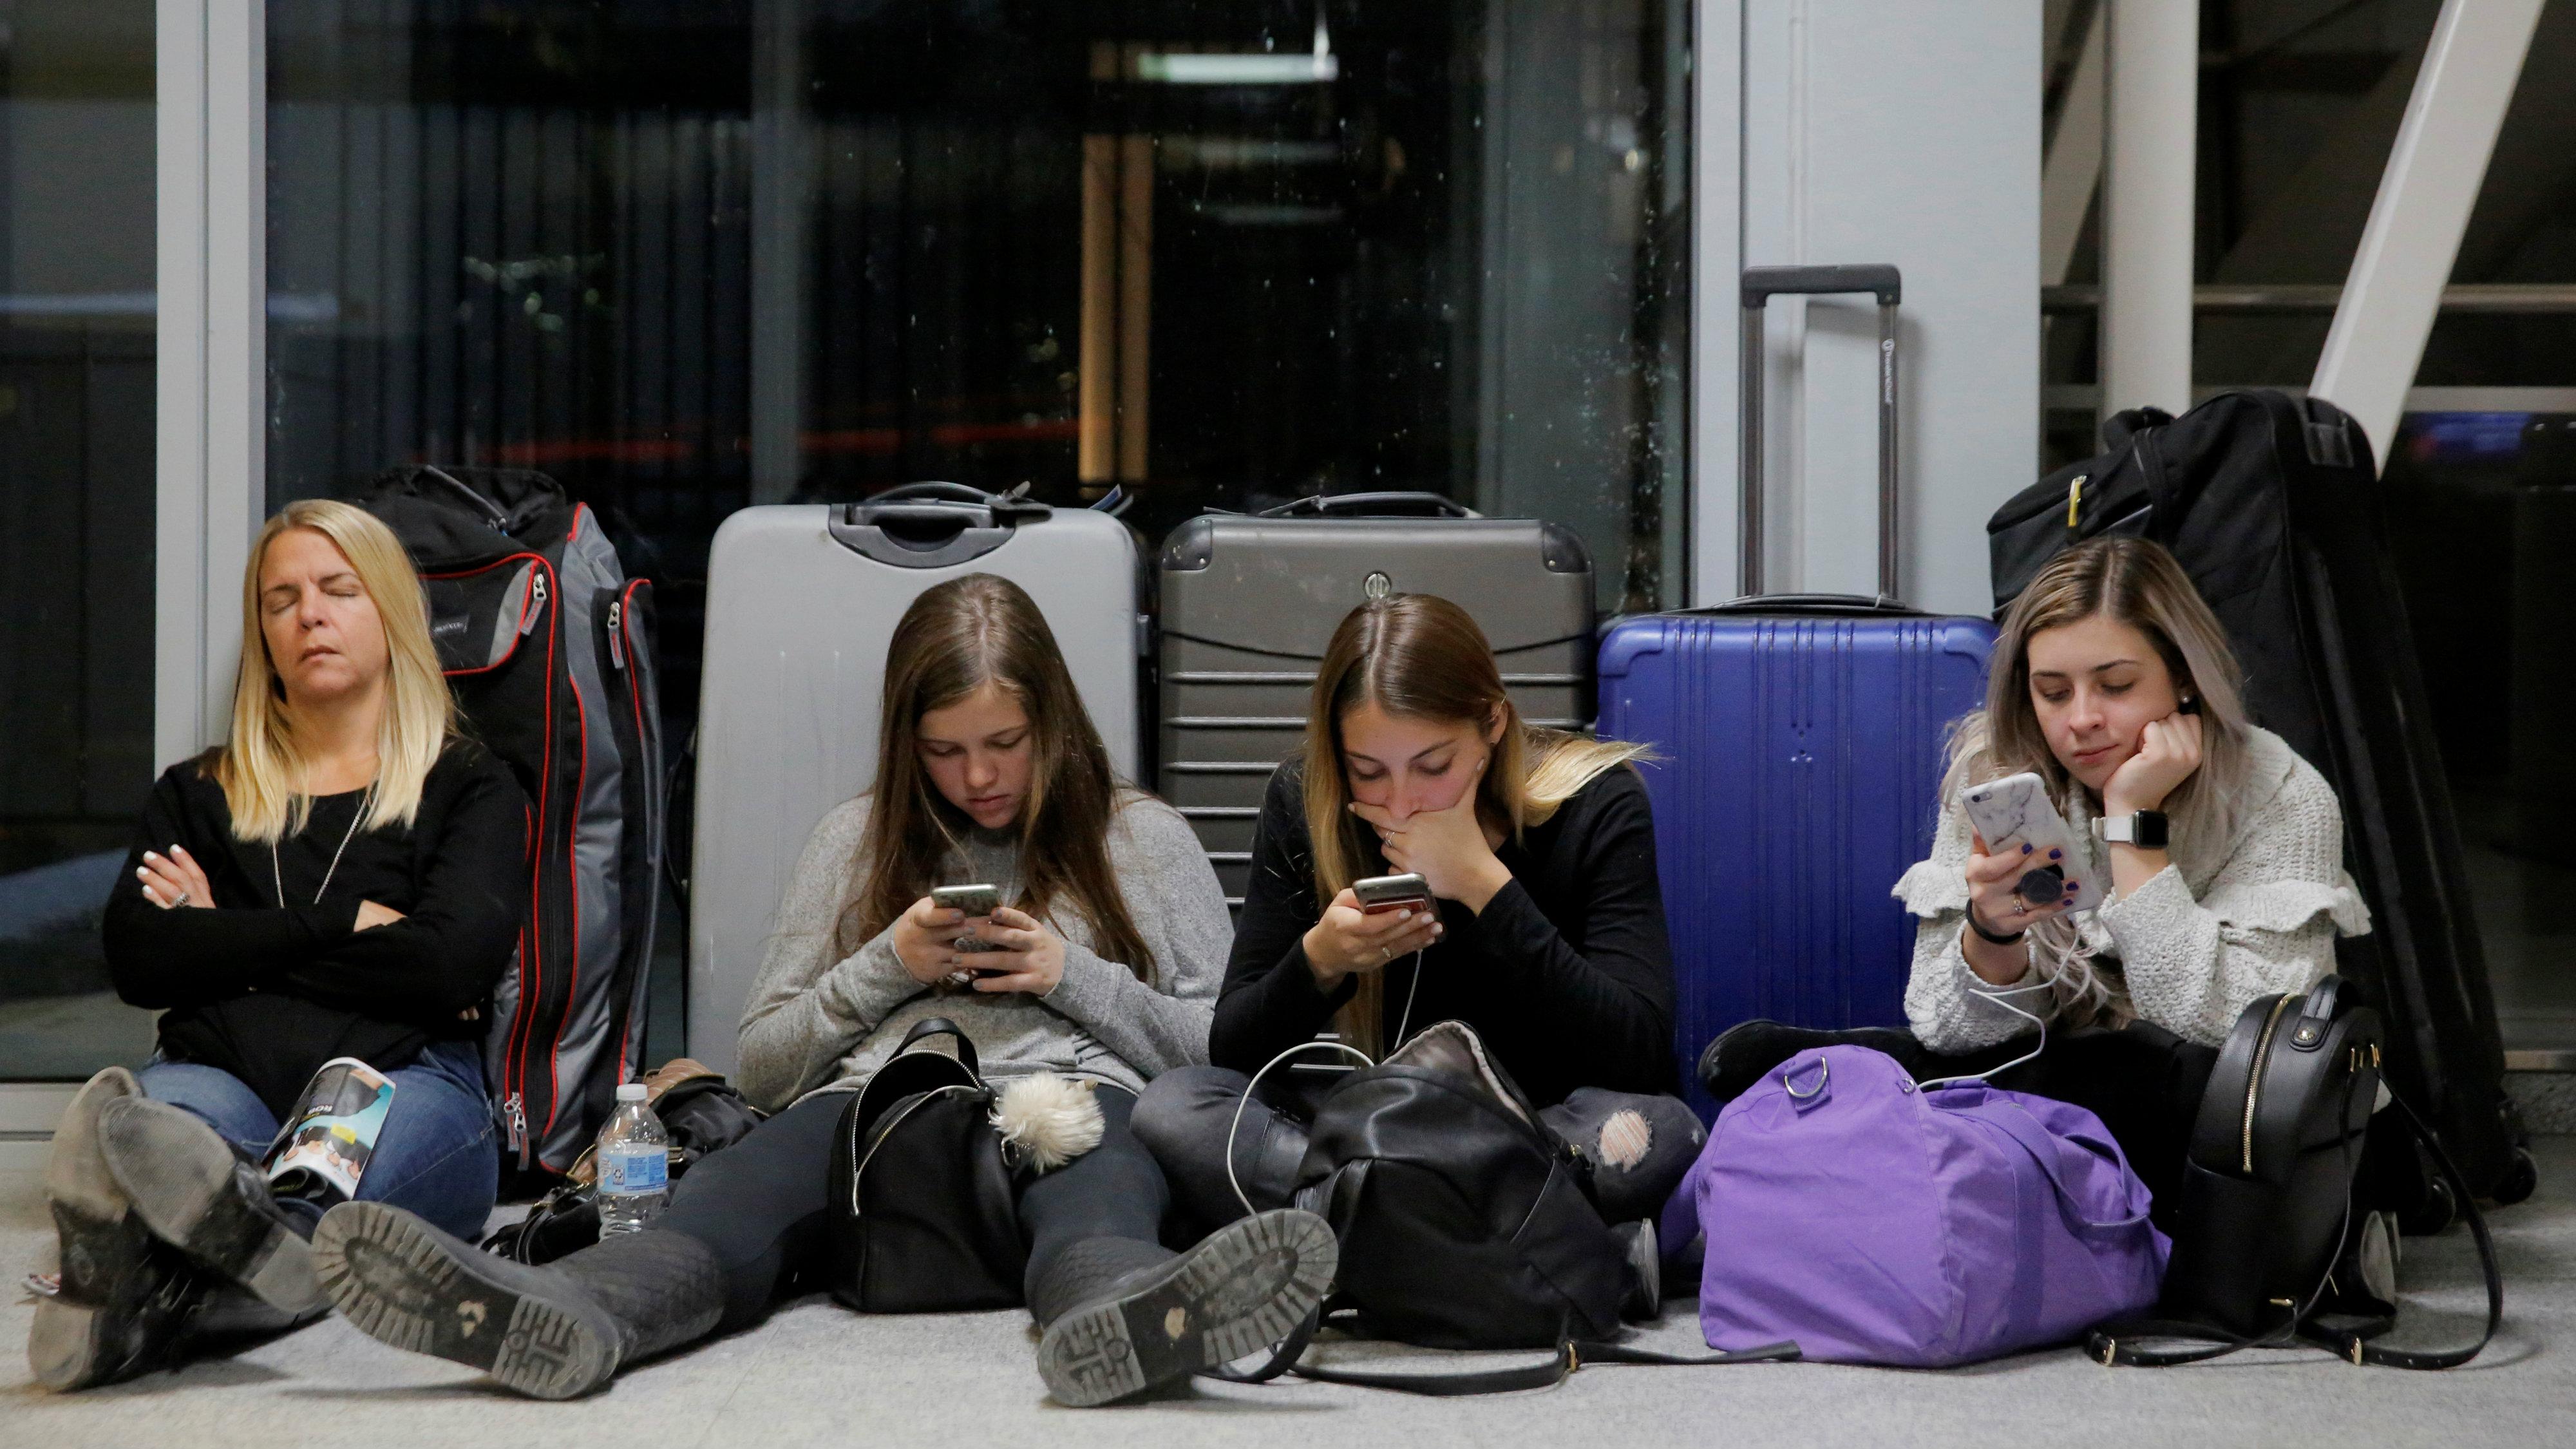 Stranded airline passengers.